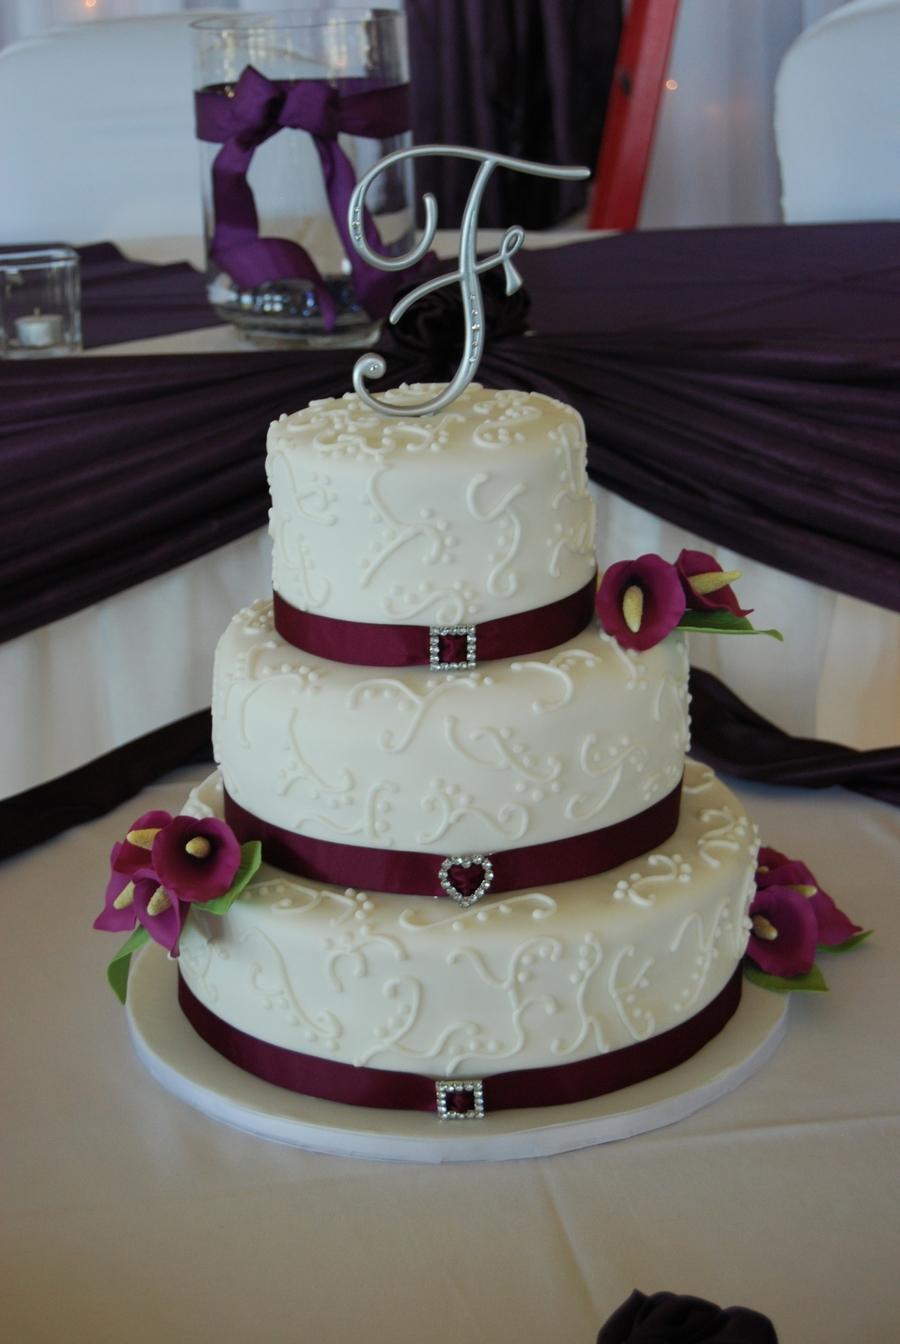 Lilies On A Wedding Cake